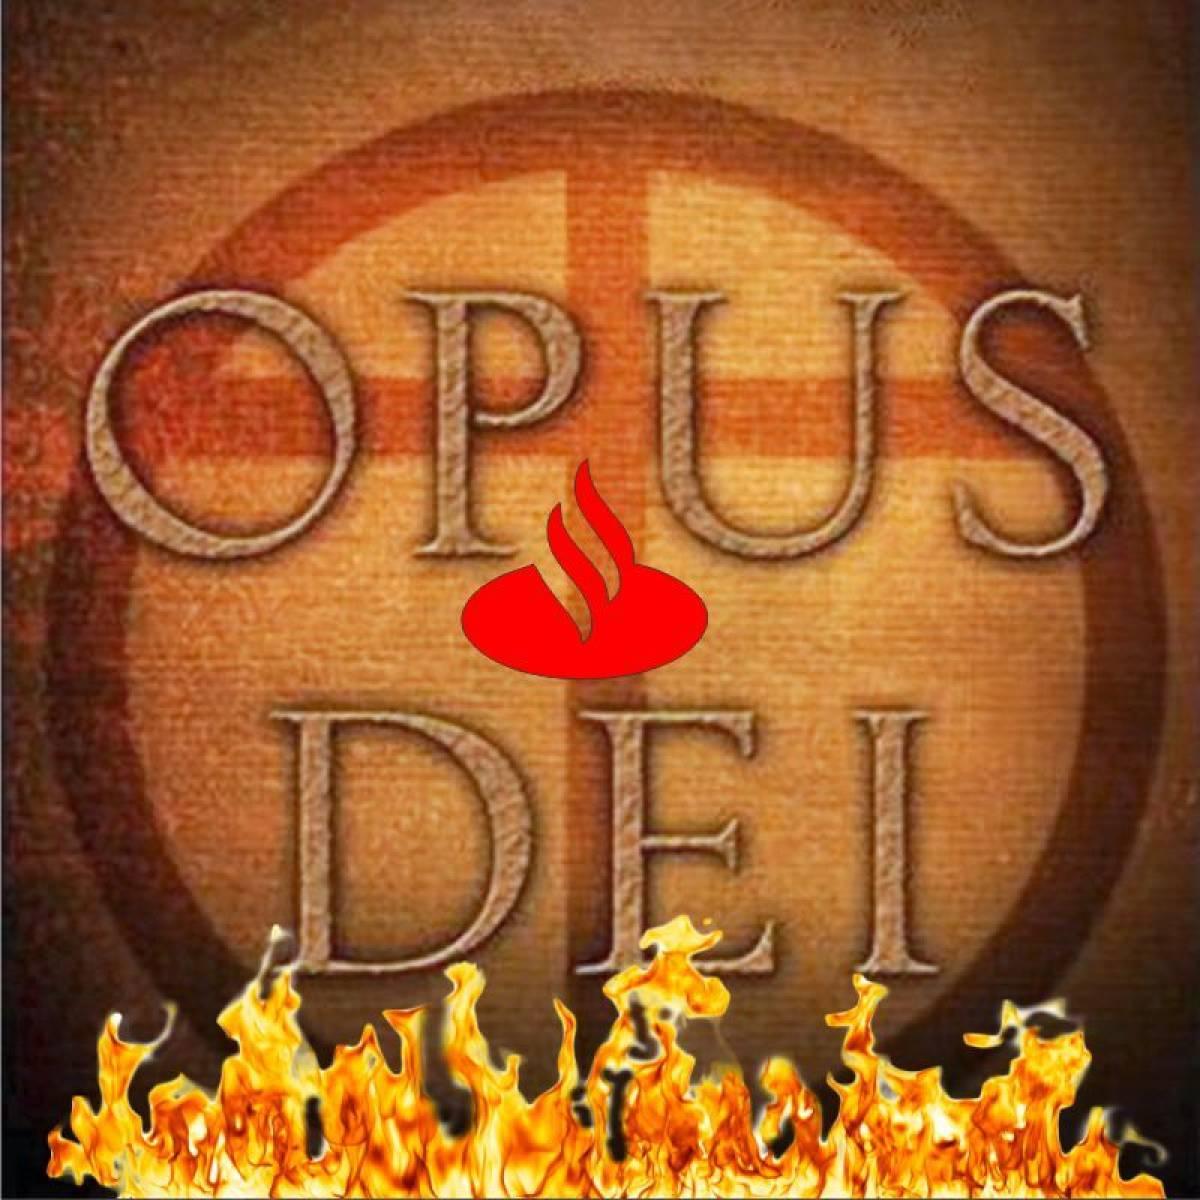 Santander, autoritarismo e Opus Dei!